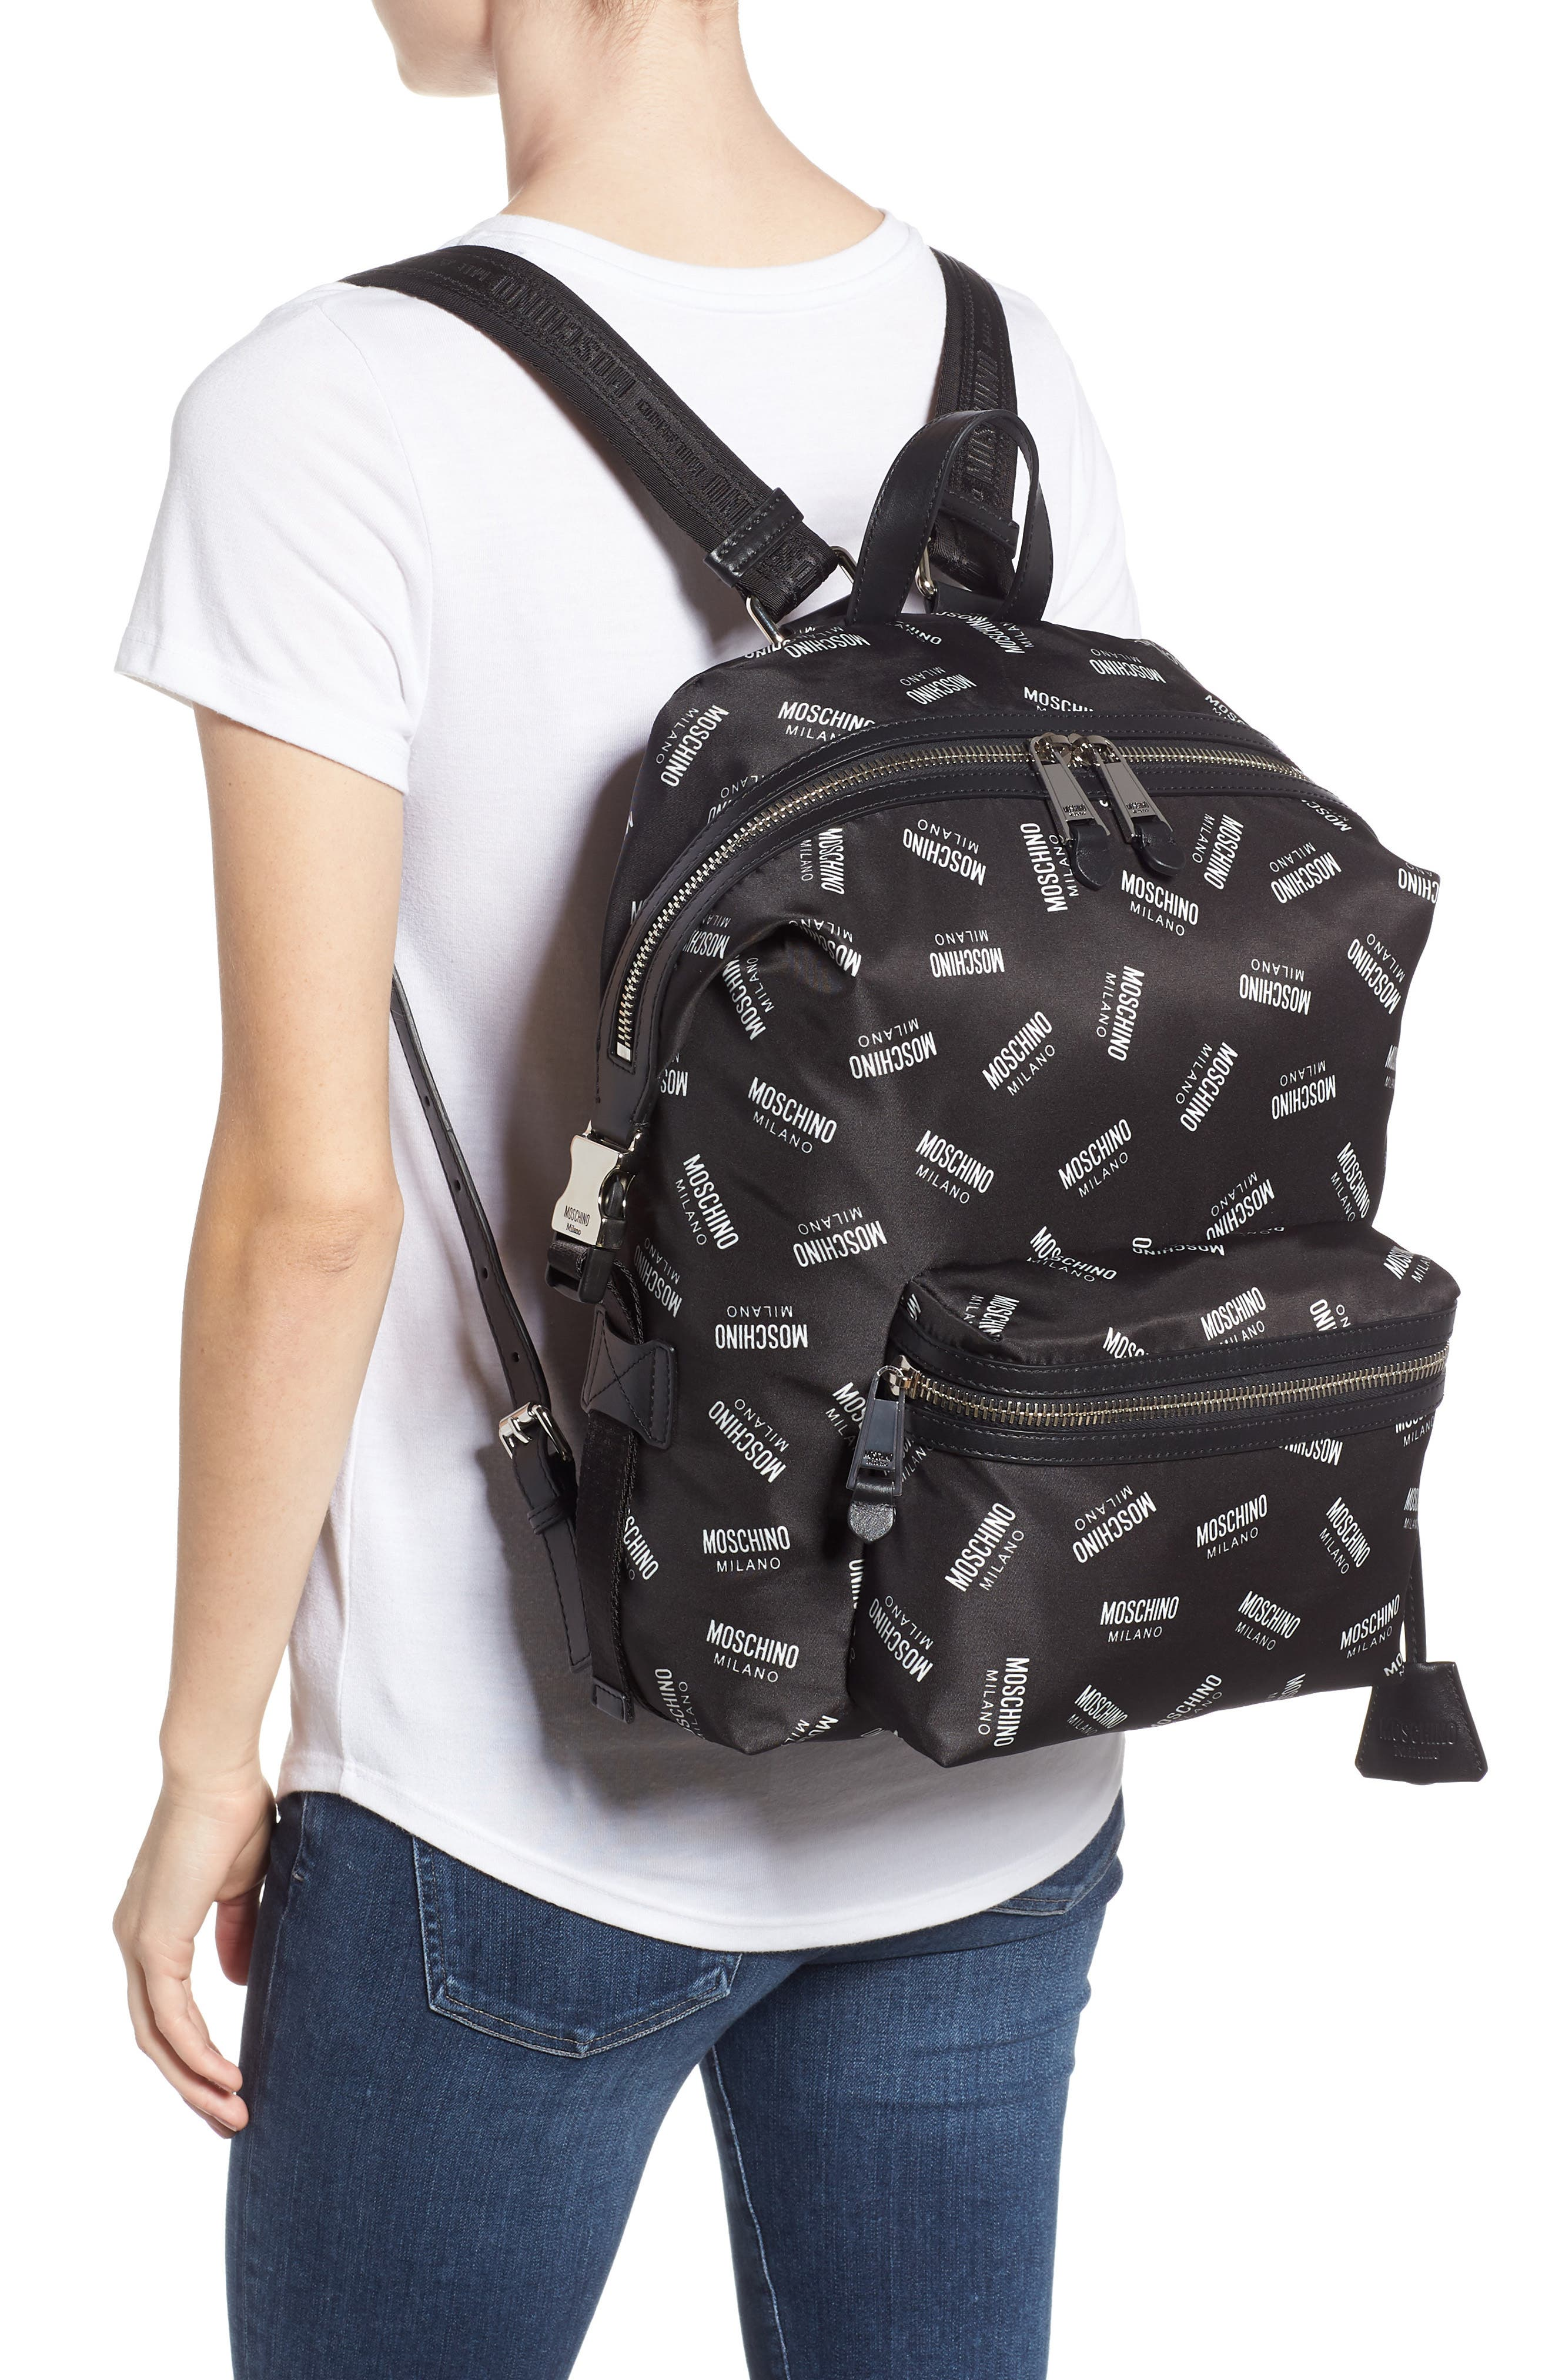 MOSCHINO,                             Allover Logo Print Backpack,                             Alternate thumbnail 2, color,                             BLACK